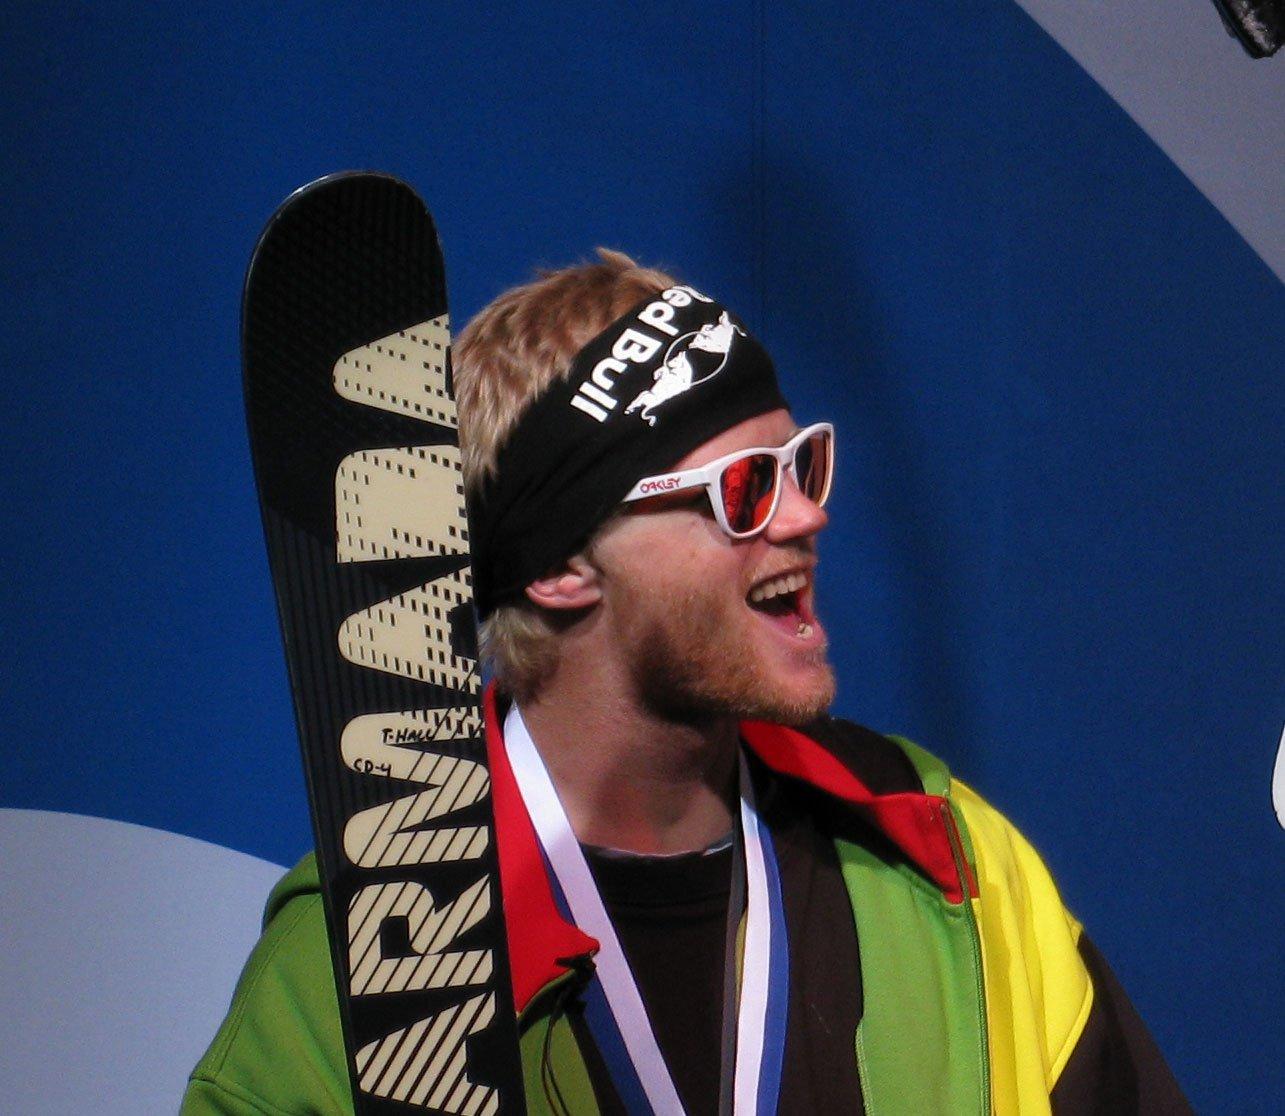 Tanner on the X podium